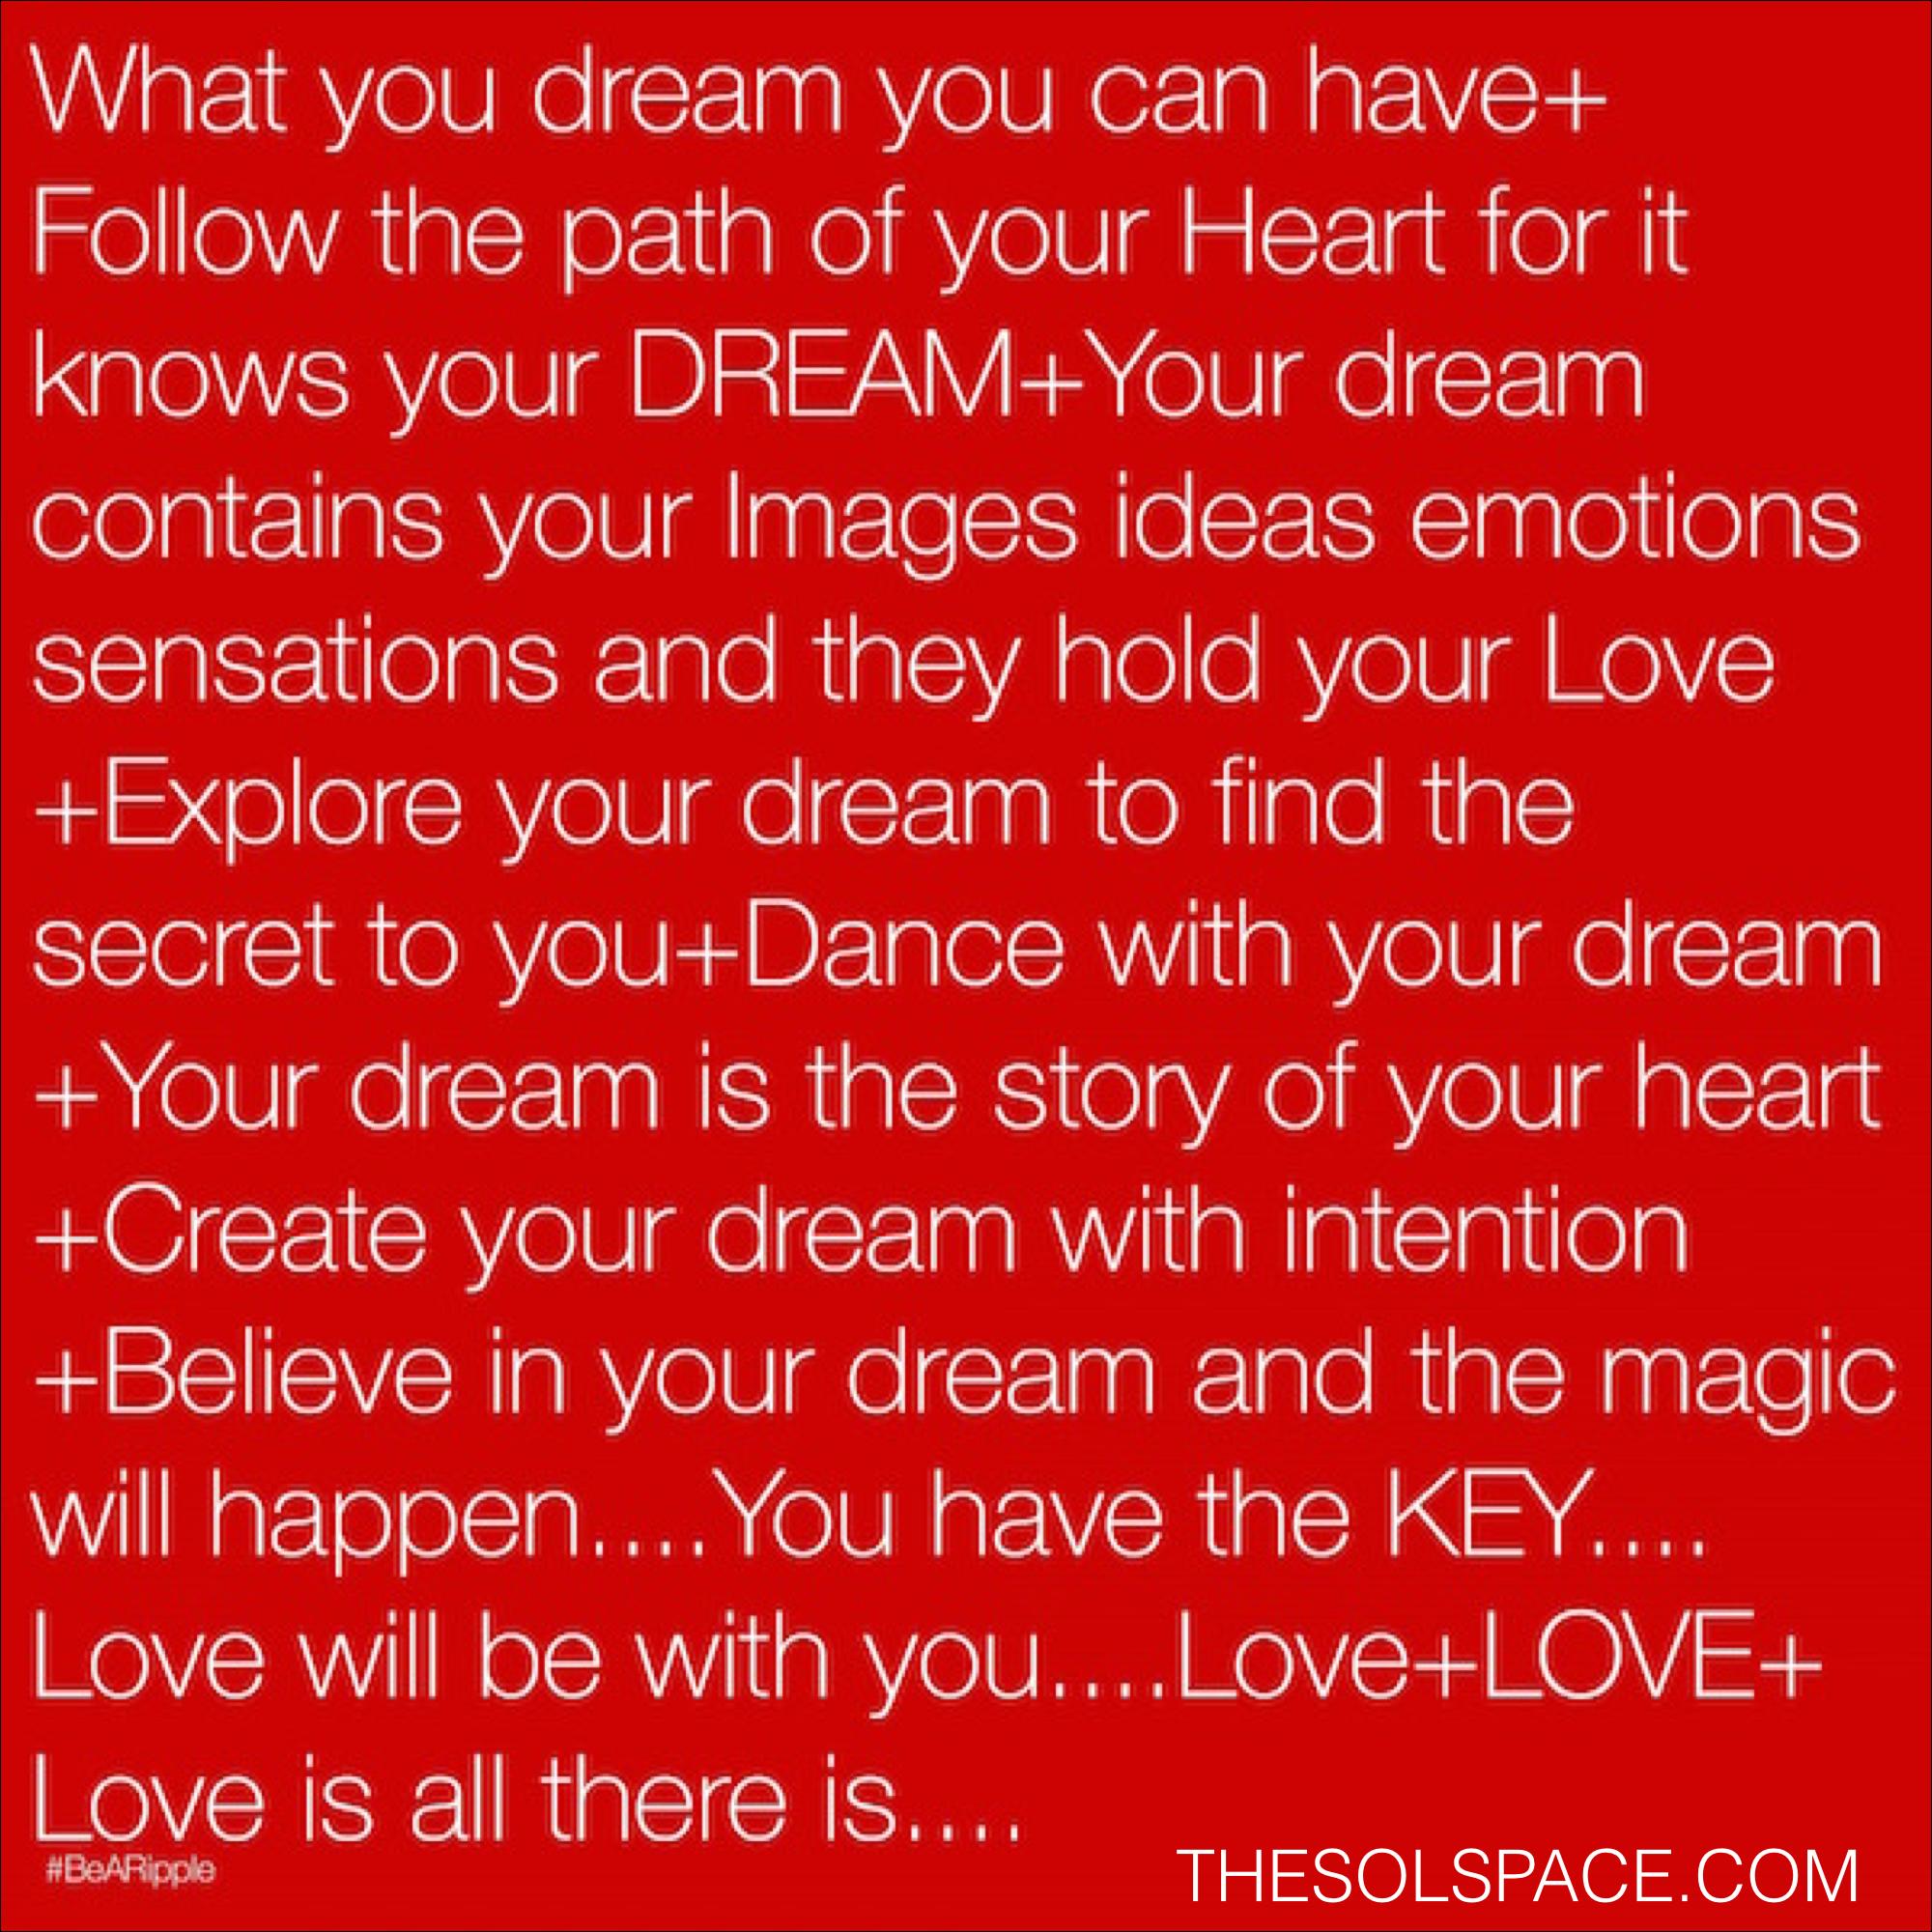 #BeARipple..DREAM @theSOLspace